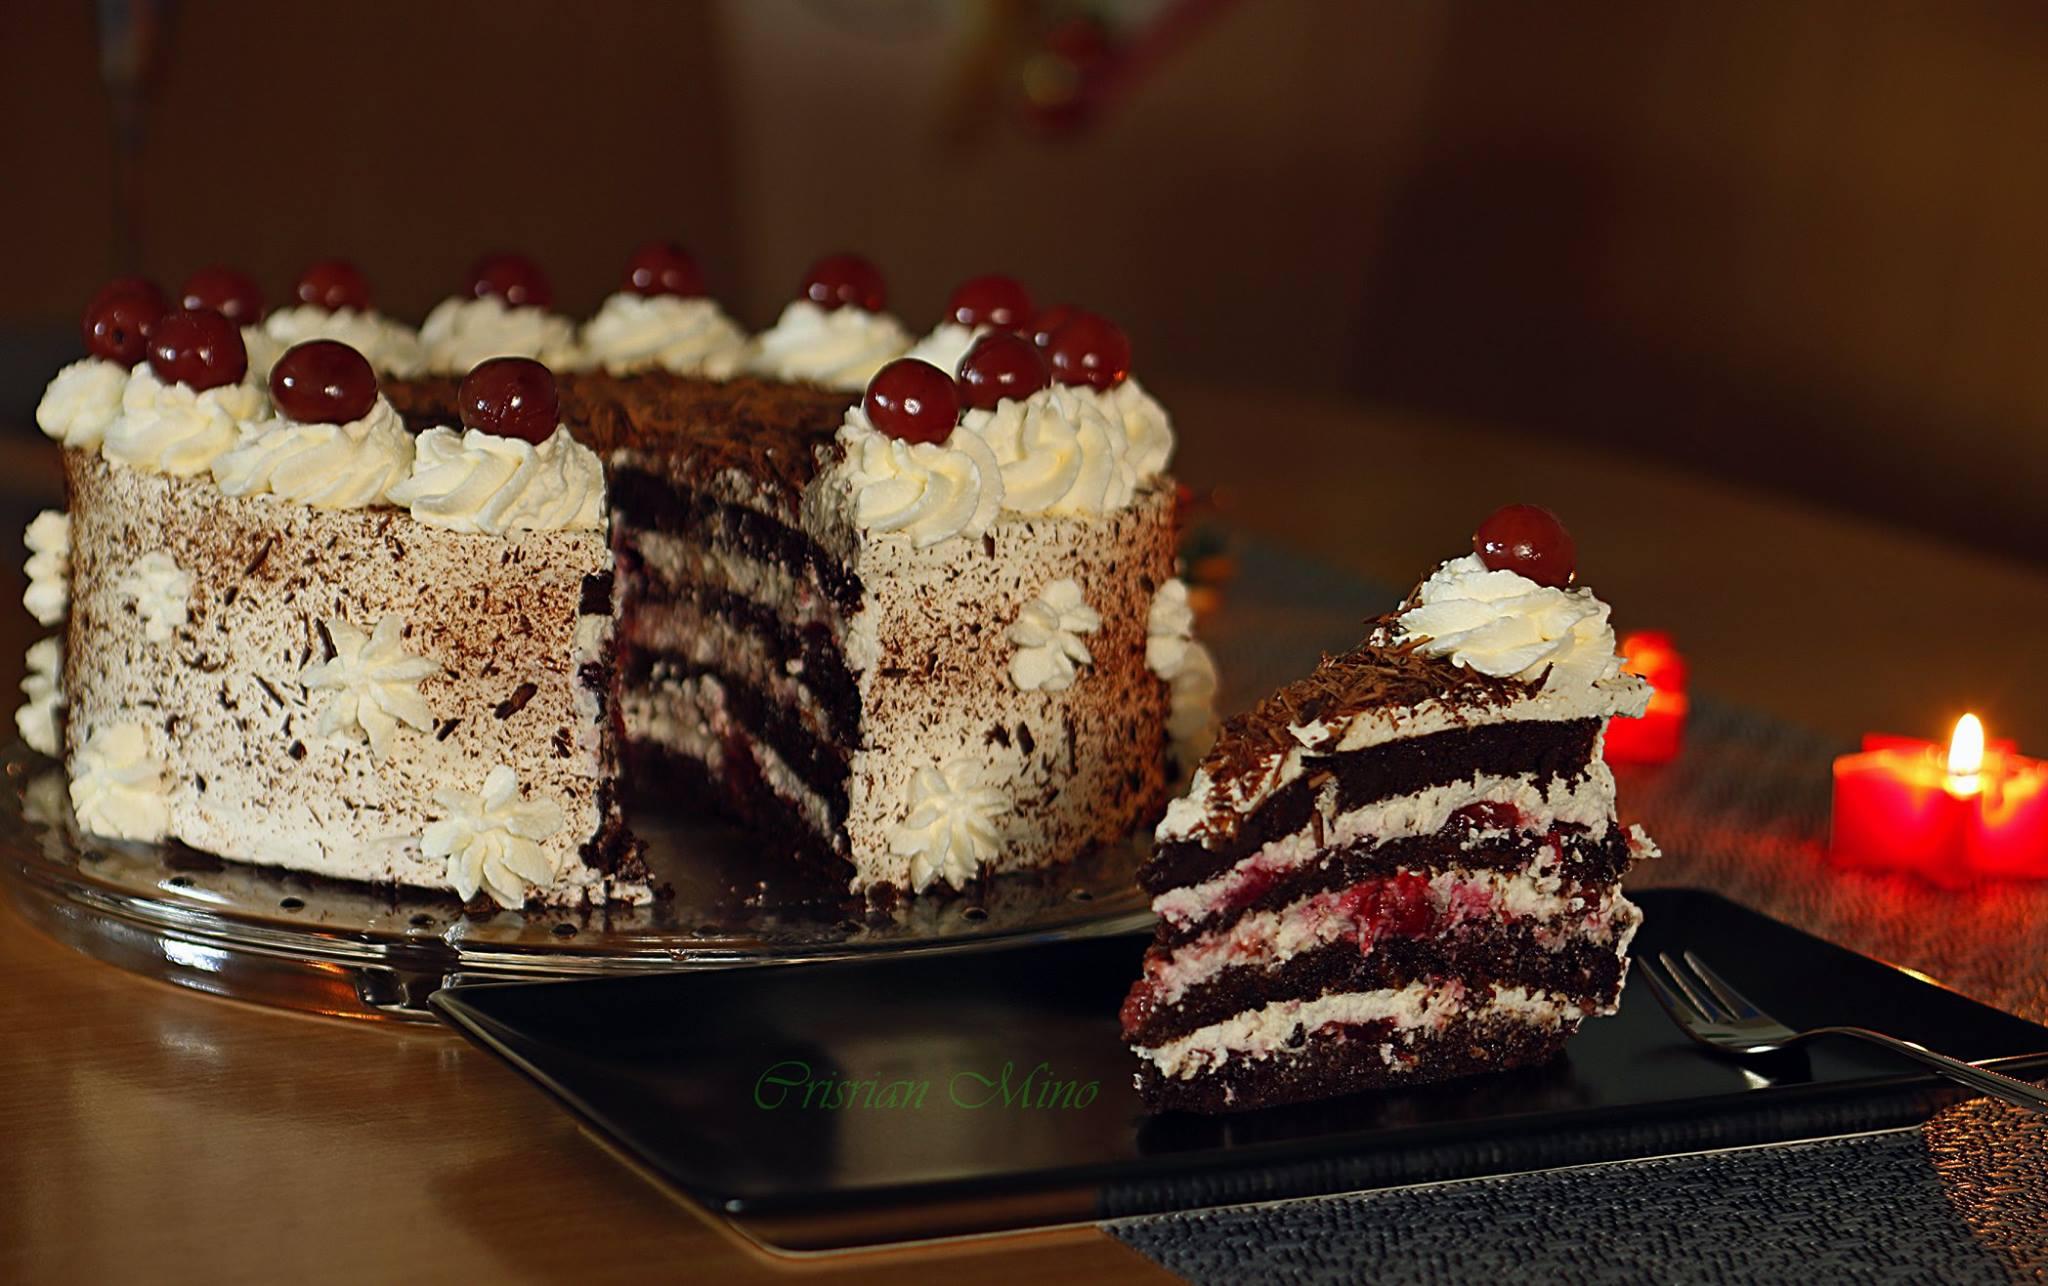 tort padurea neagra by cristian mino